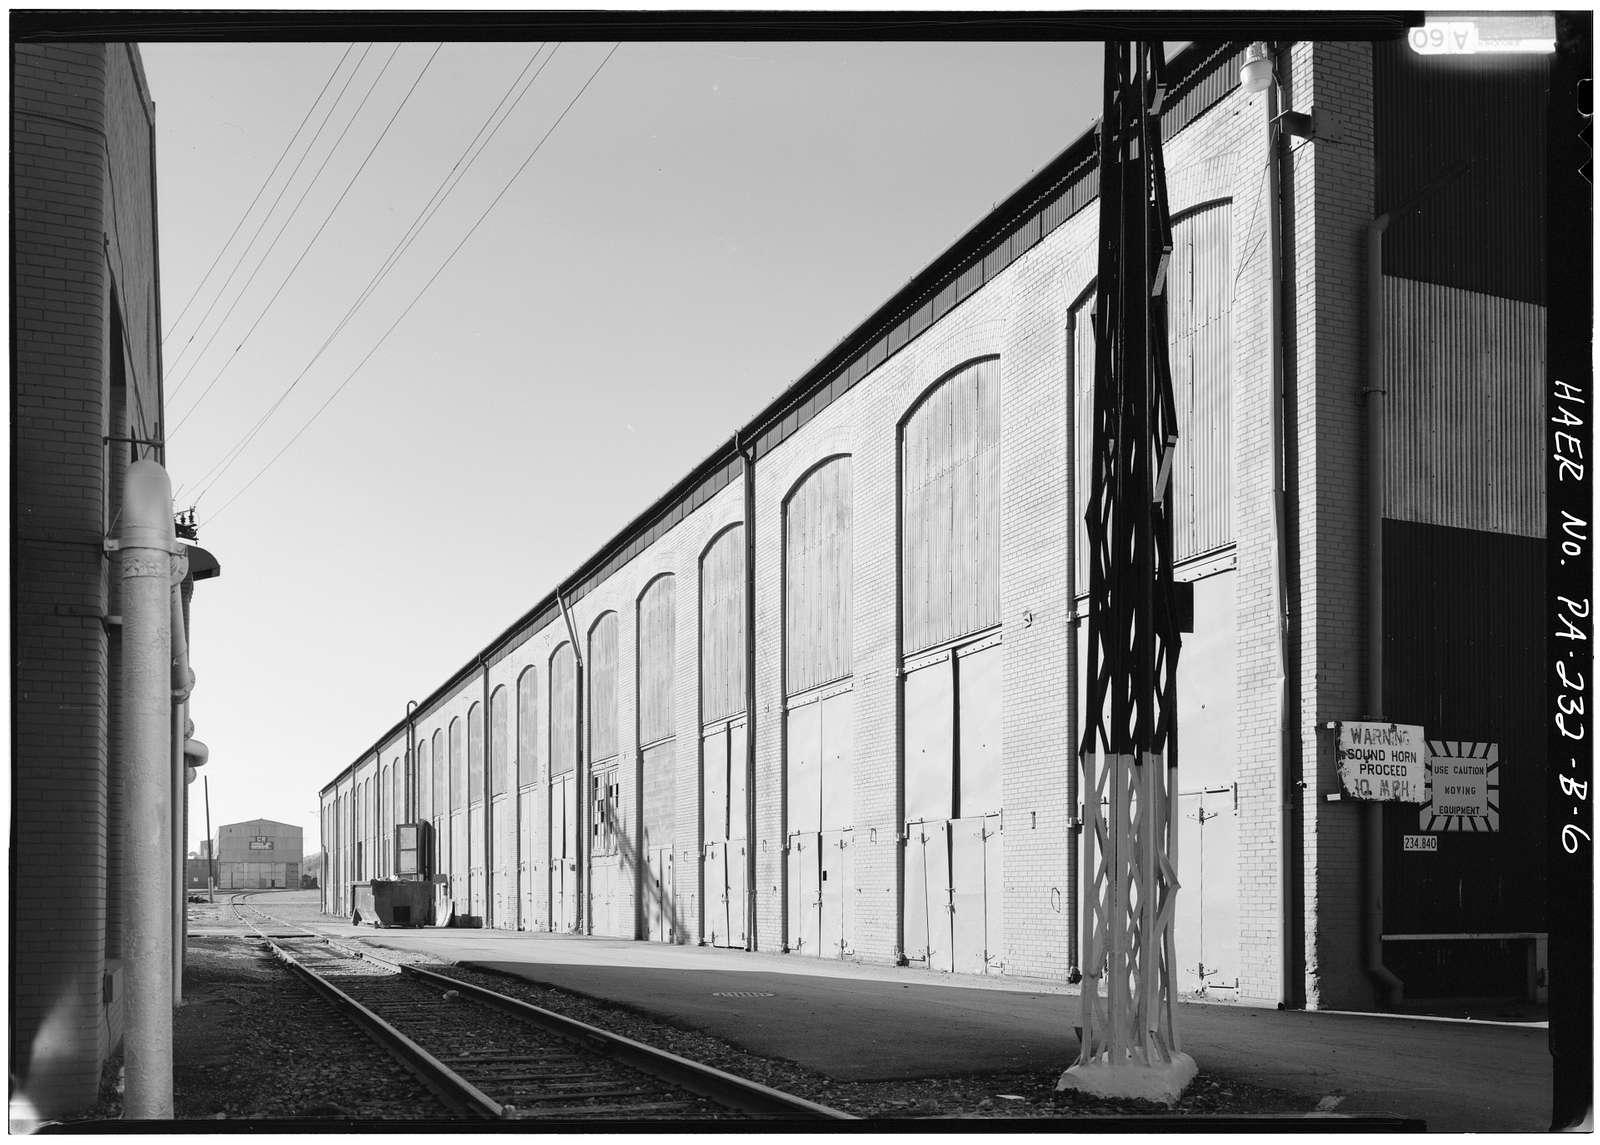 Juniata Shops, Blacksmith Shop No. 2, East of Fourth Avenue, between First & Second Streets, Altoona, Blair County, PA